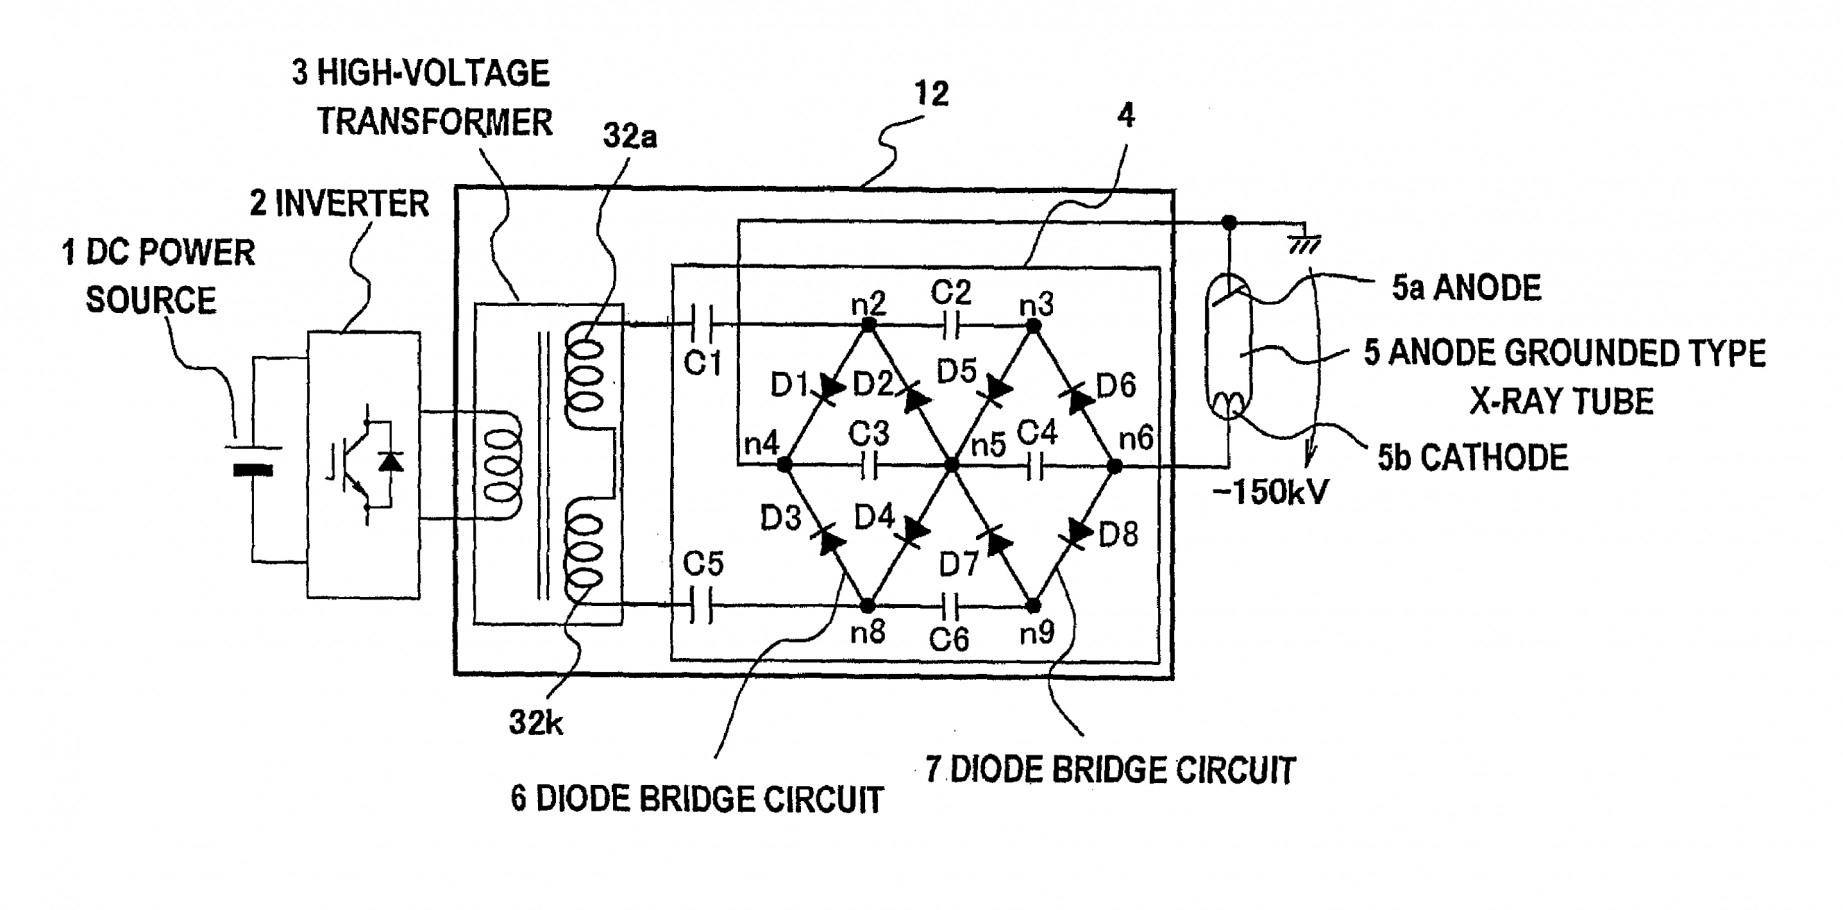 Progressive Dynamics Converter Wiring Diagram | Manual E-Books - Progressive Dynamics Power Converter Wiring Diagram